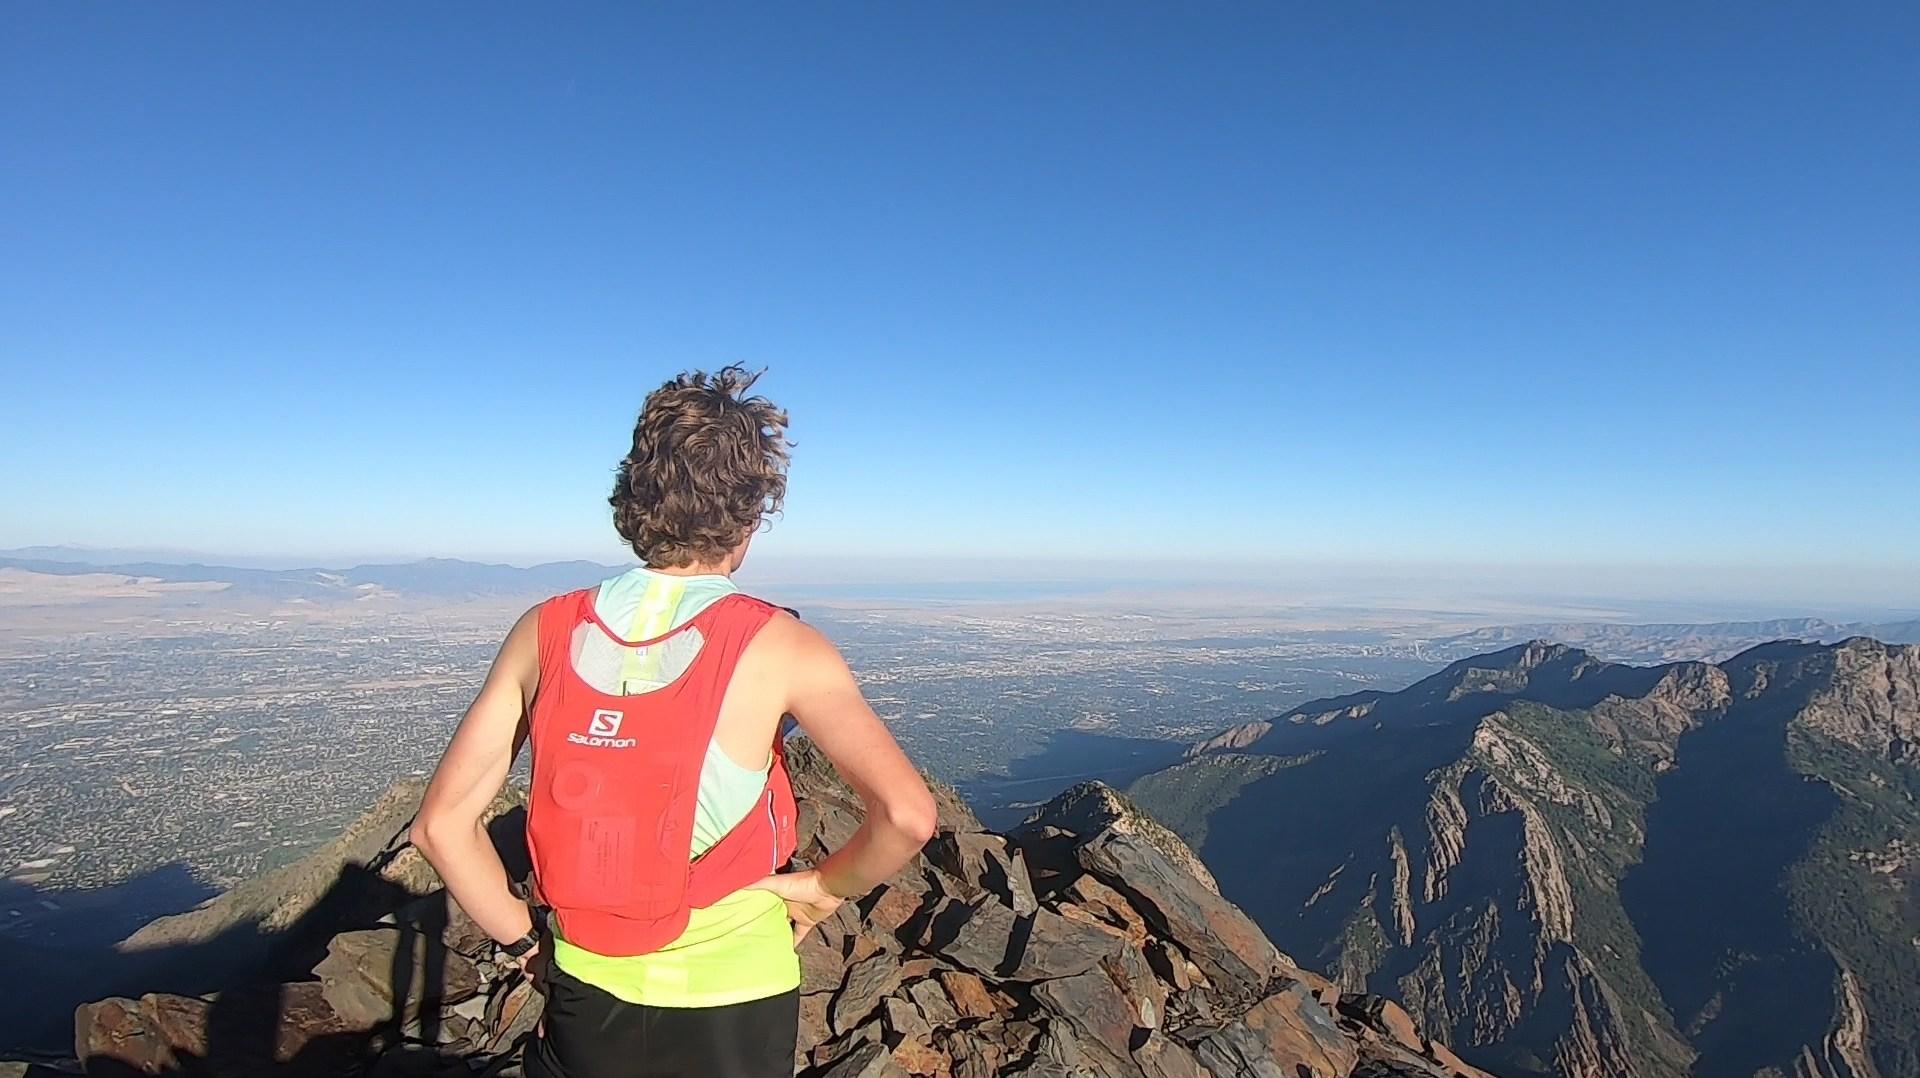 Top of first peak